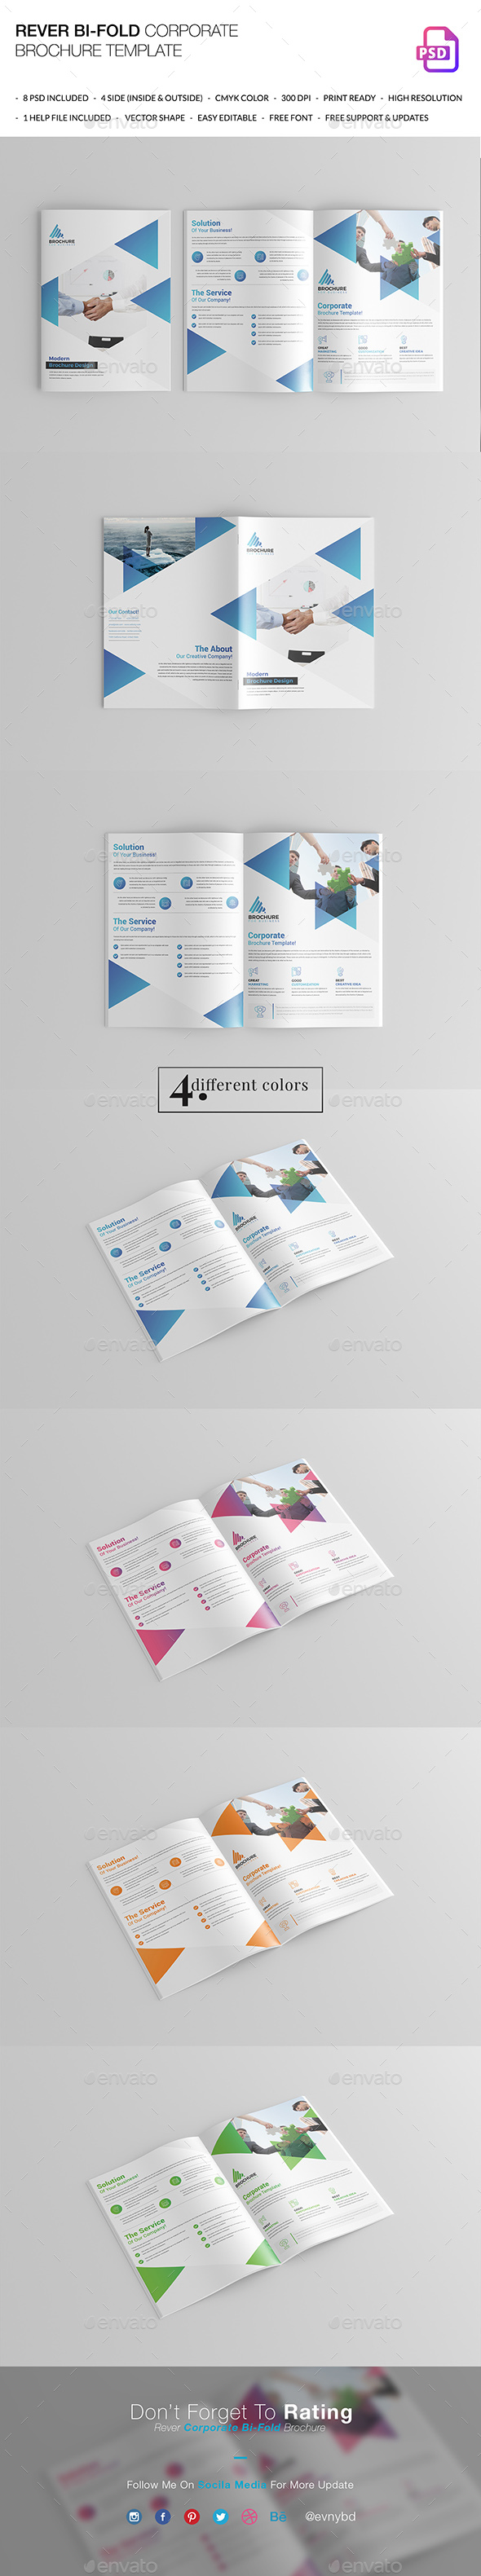 Rever Bi-Fold Brochure Template - Brochures Print Templates